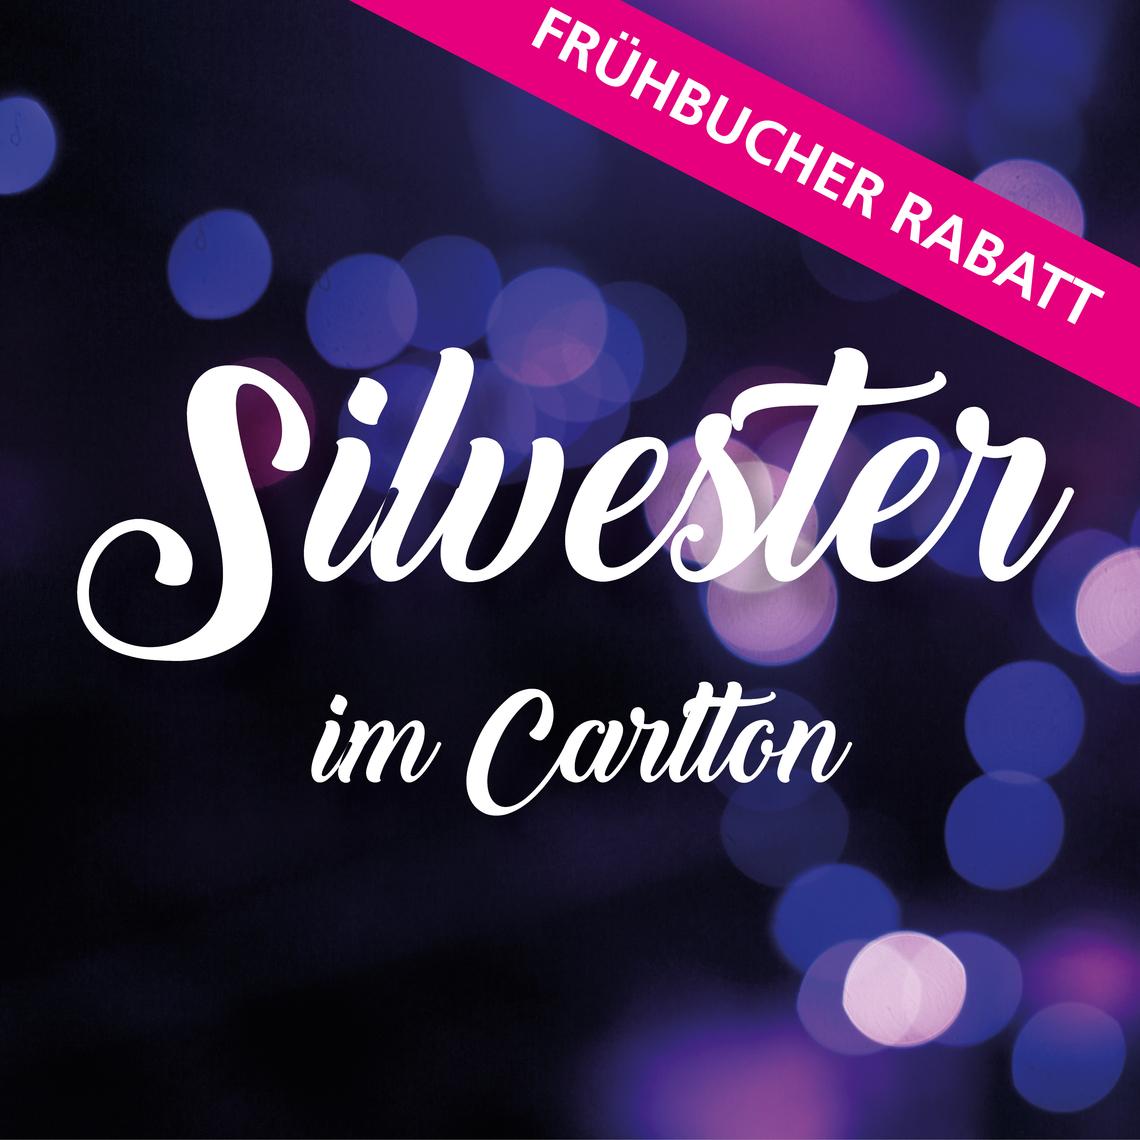 Frühbucher - Silvester im Carlton